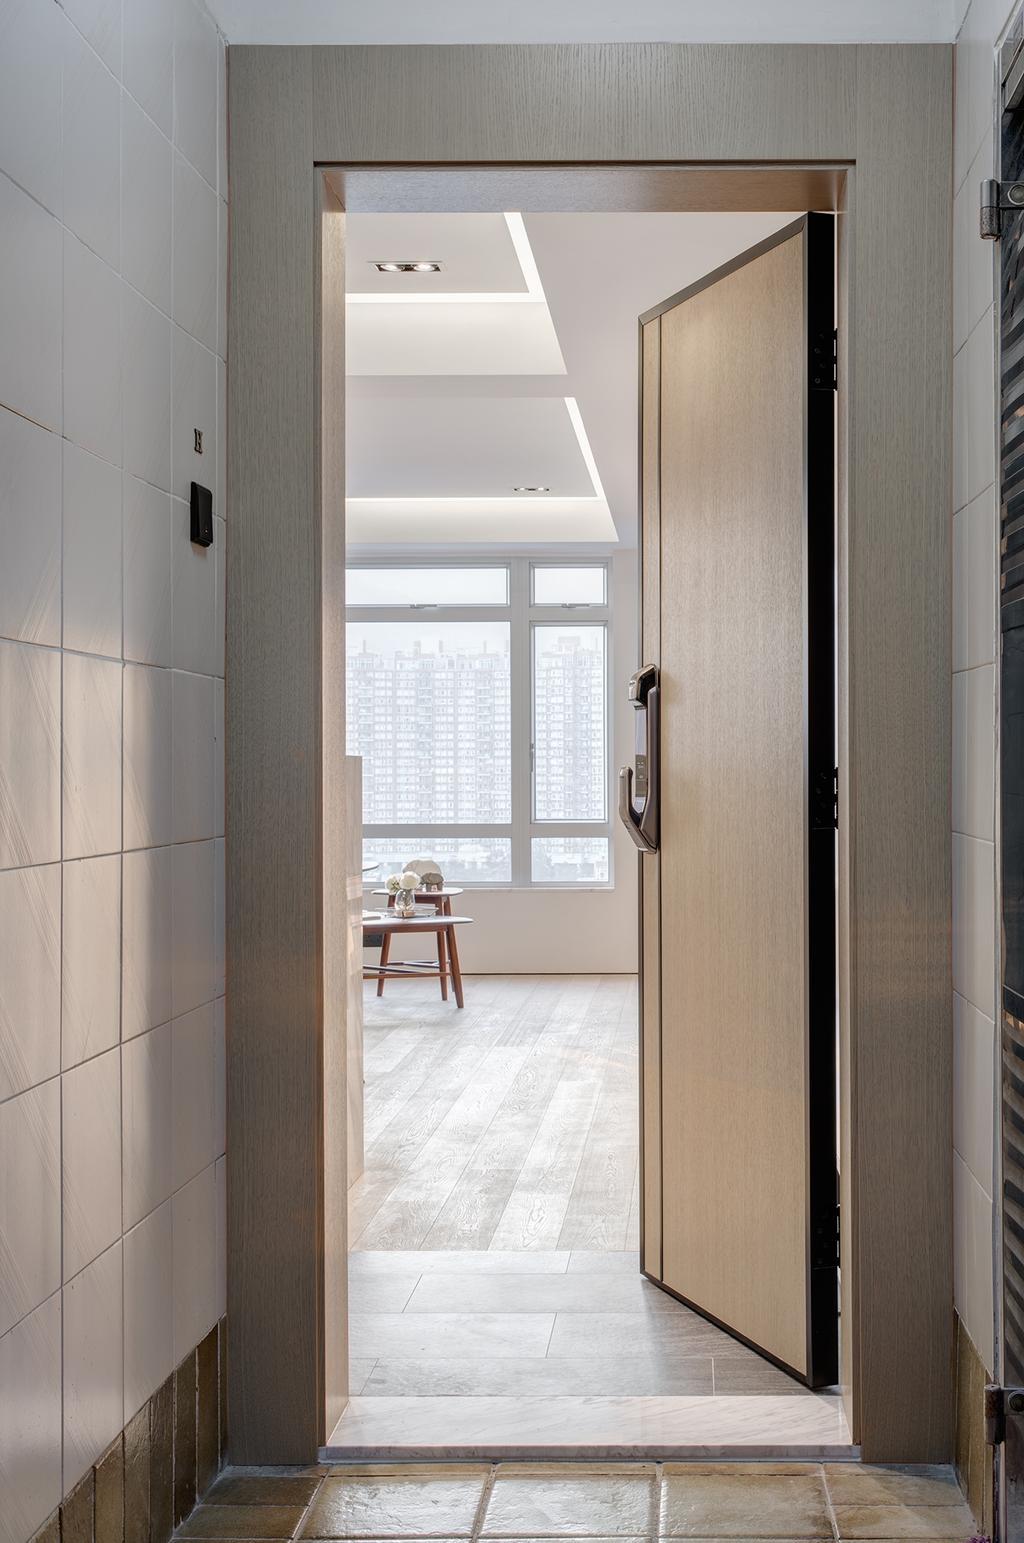 簡約, 私家樓, 銀禧花園, 室內設計師, in Him's Interior Design, 摩登